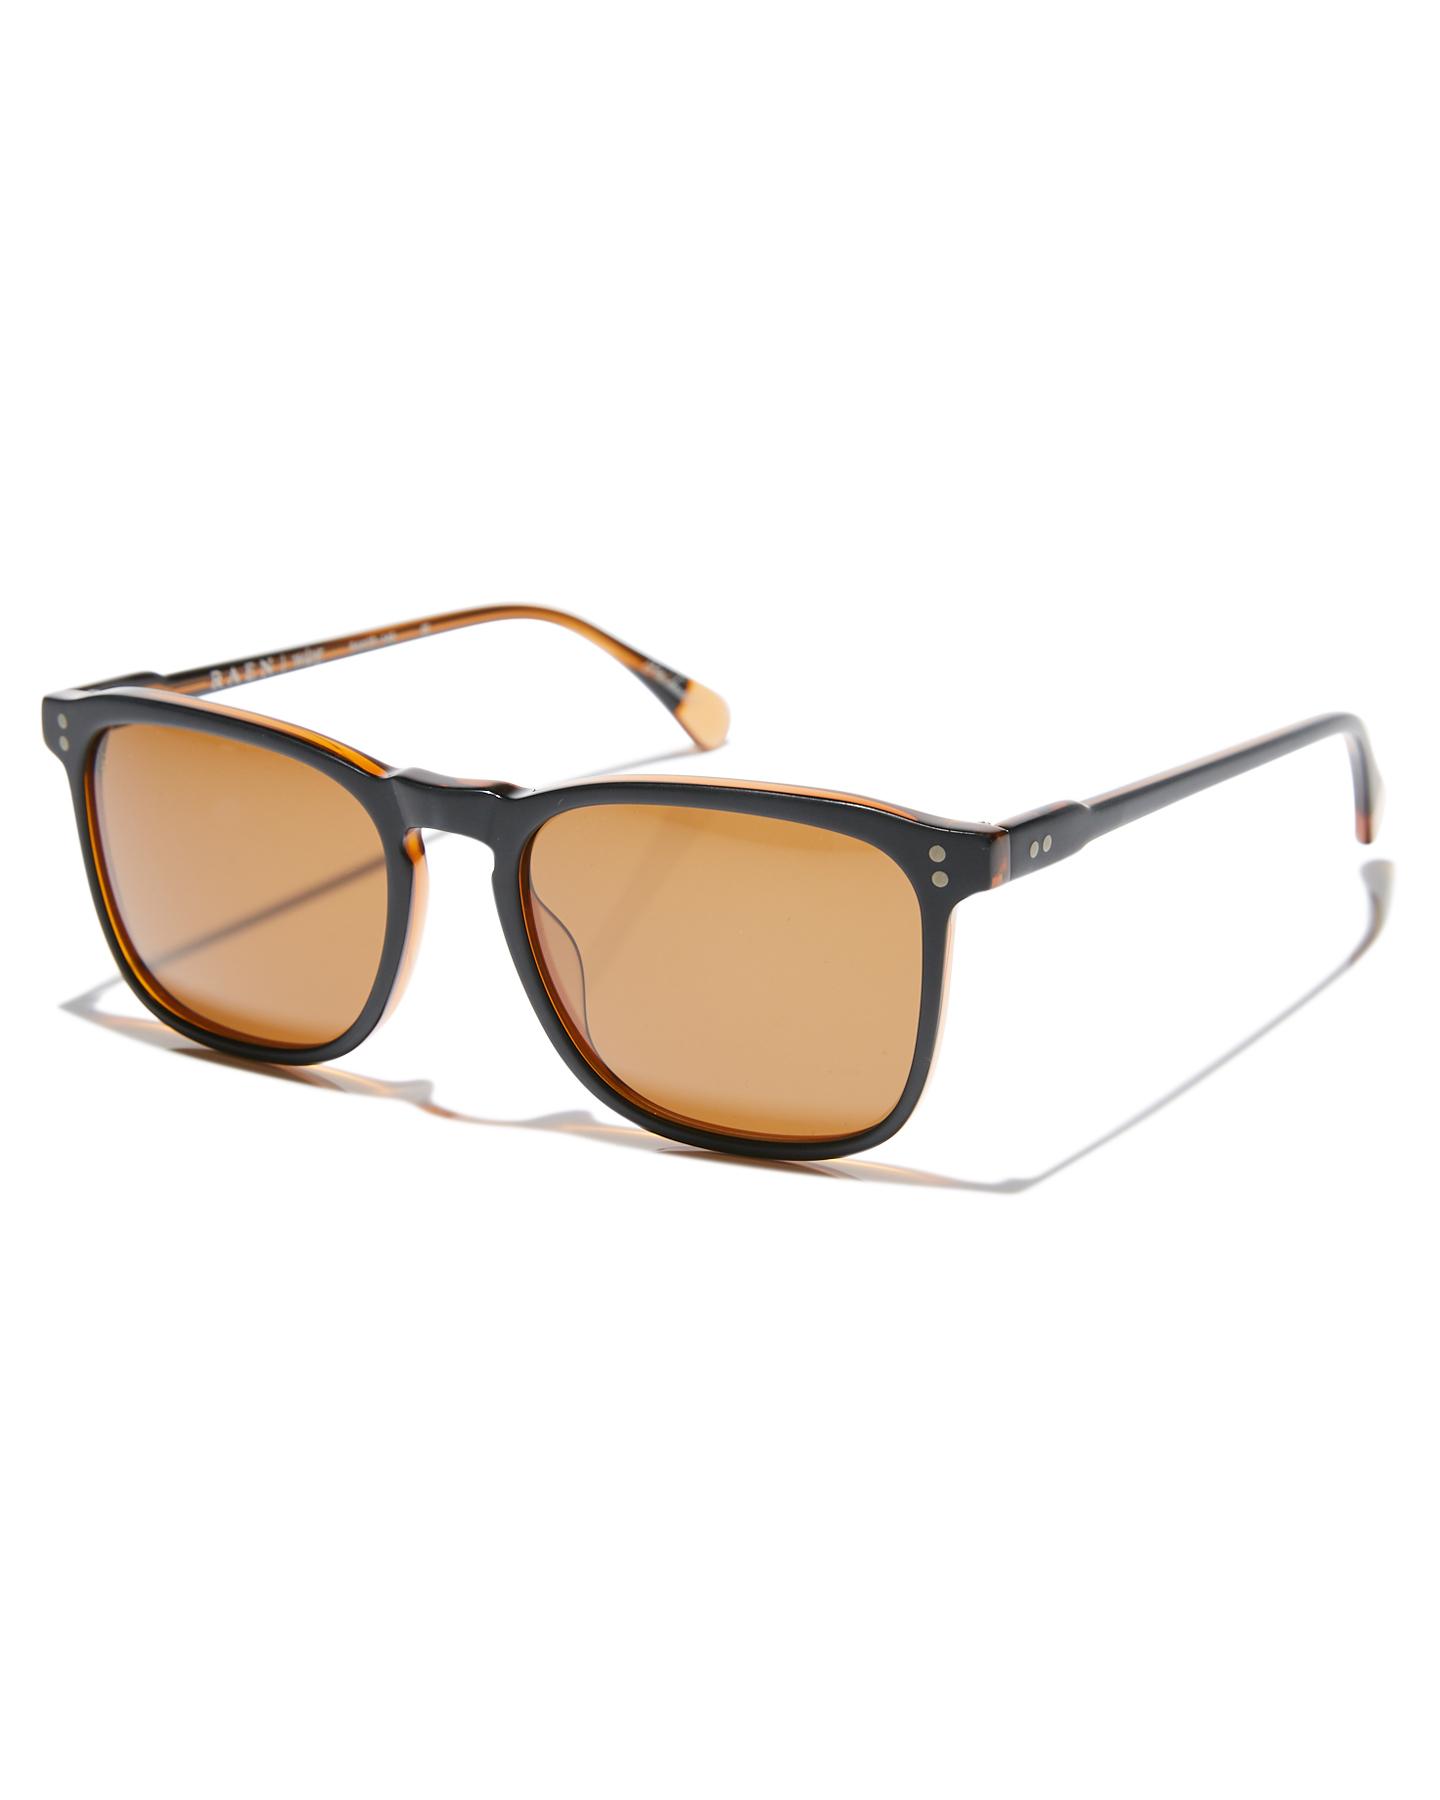 7c0df91732 Raen Wiley Polarized Sunglasses Black Brown Mens sunglasses Size ...